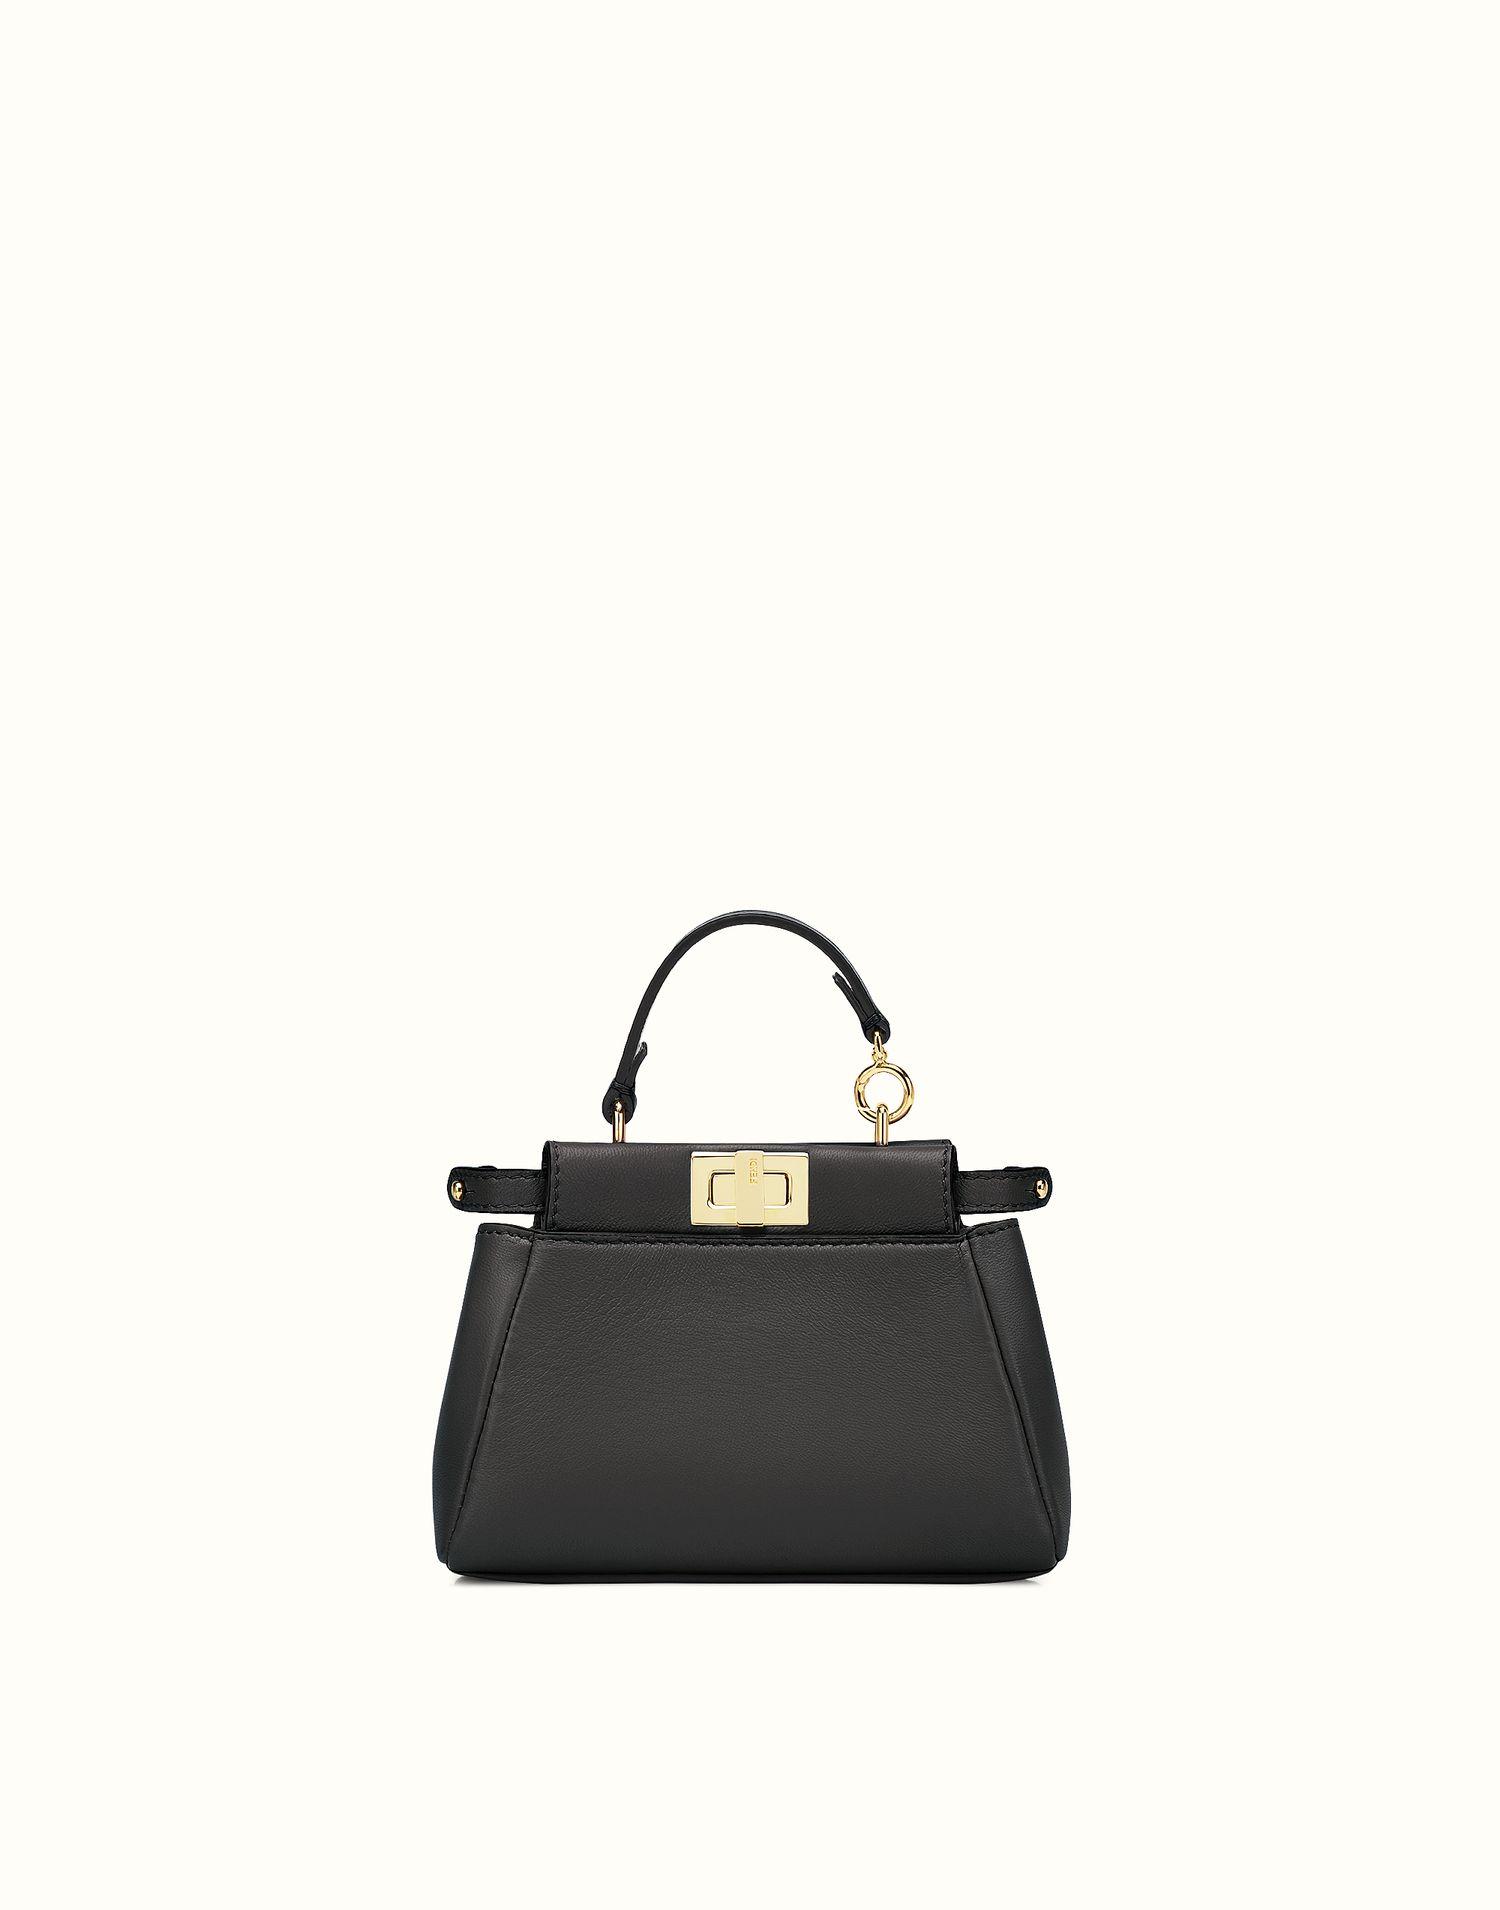 FENDI   MICRO PEEKABOO micro bag in black leather   handbag dreams ... e8e4c8bdbb